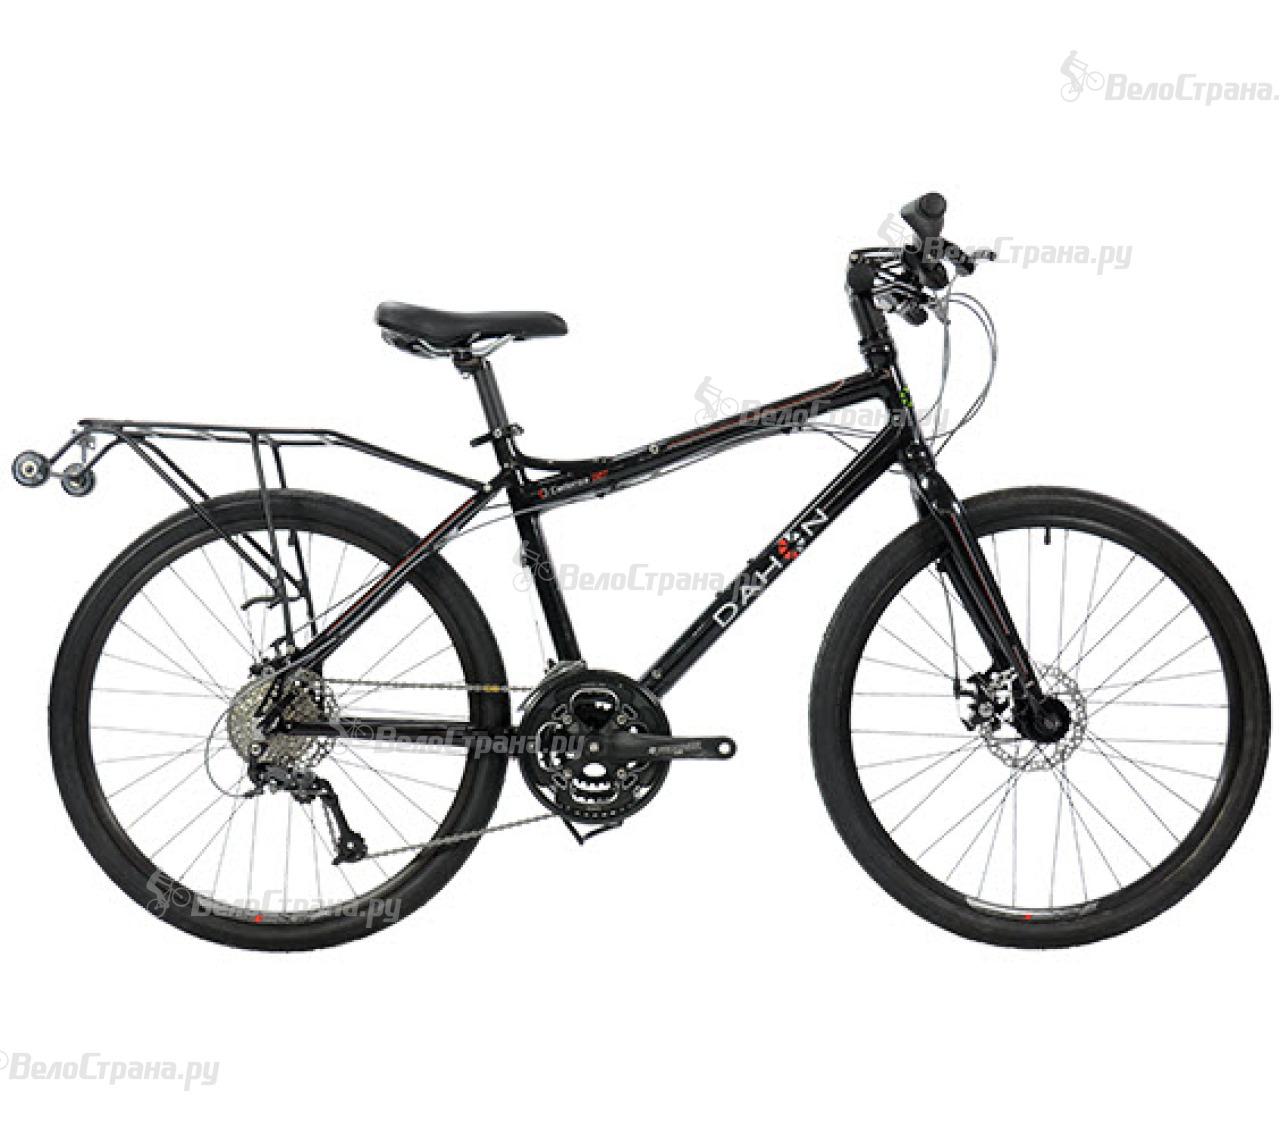 Велосипед Dahon Cadenza D27 (2016) велосипед dahon speed d7 2014